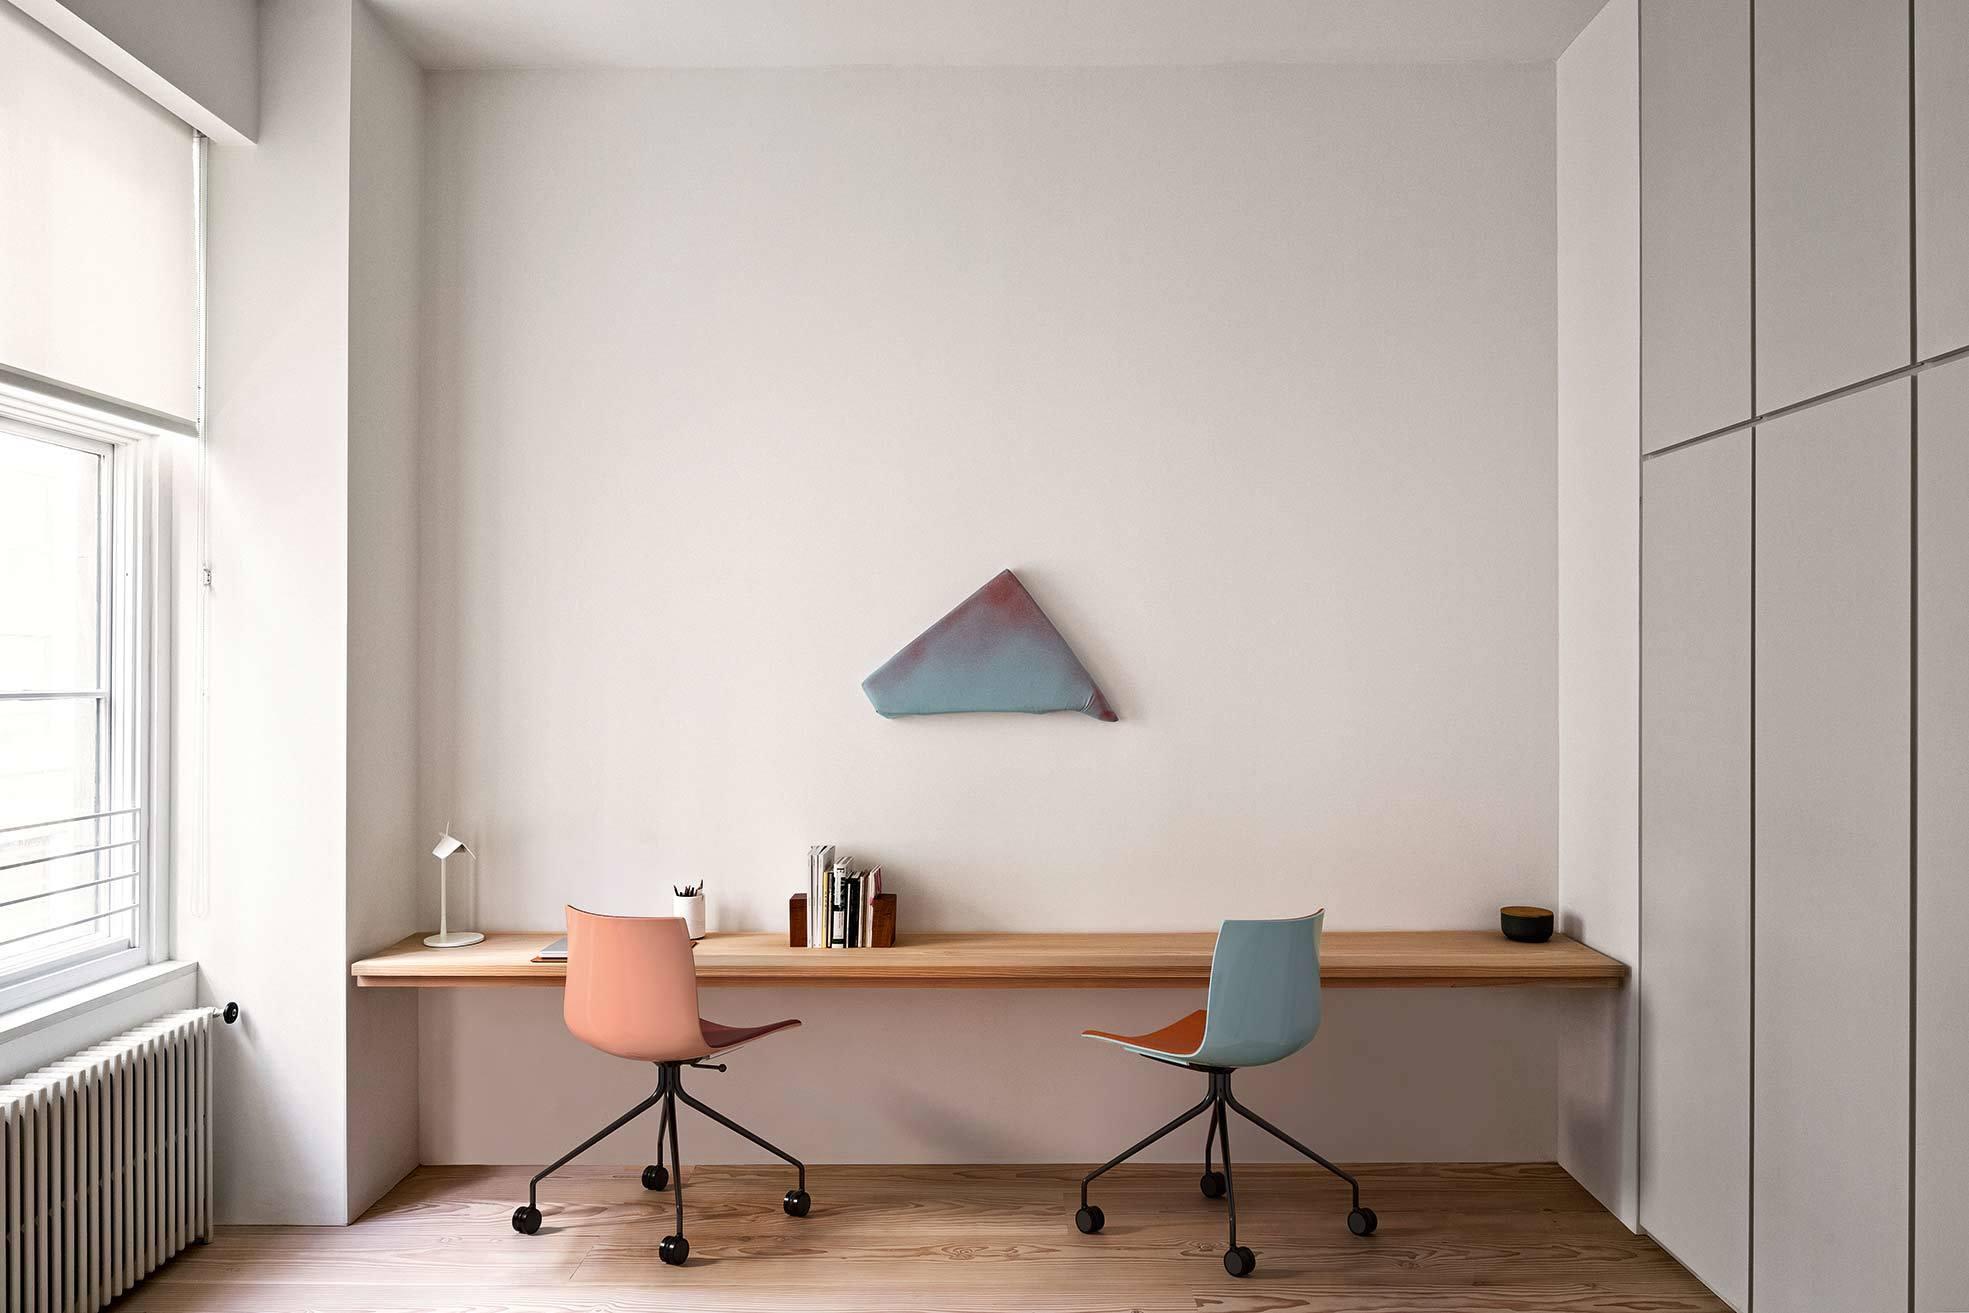 Catifa 46 New Edition für Arper, Design: Lievore Altherr Molina, 2016